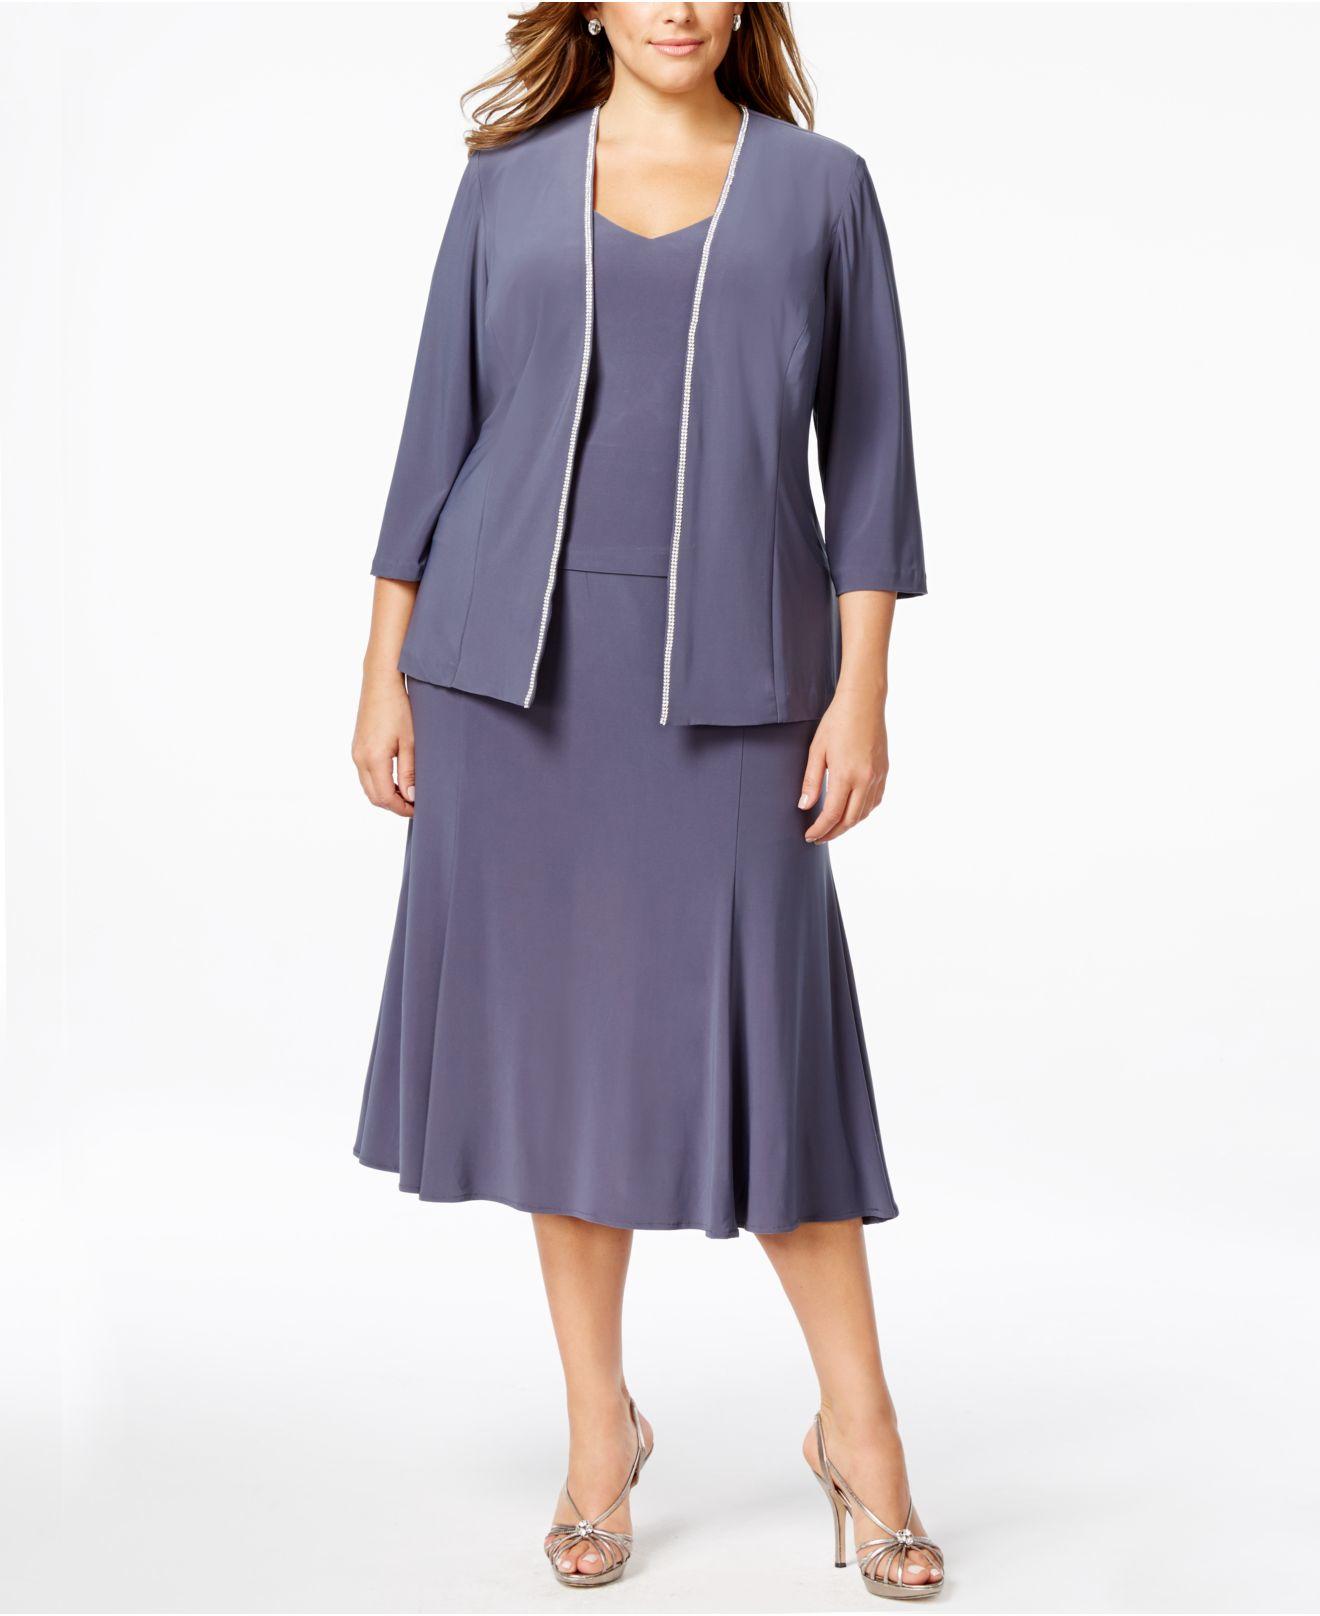 Alex Evenings Metallic Plus Size Rhinestone Dress And Jacket